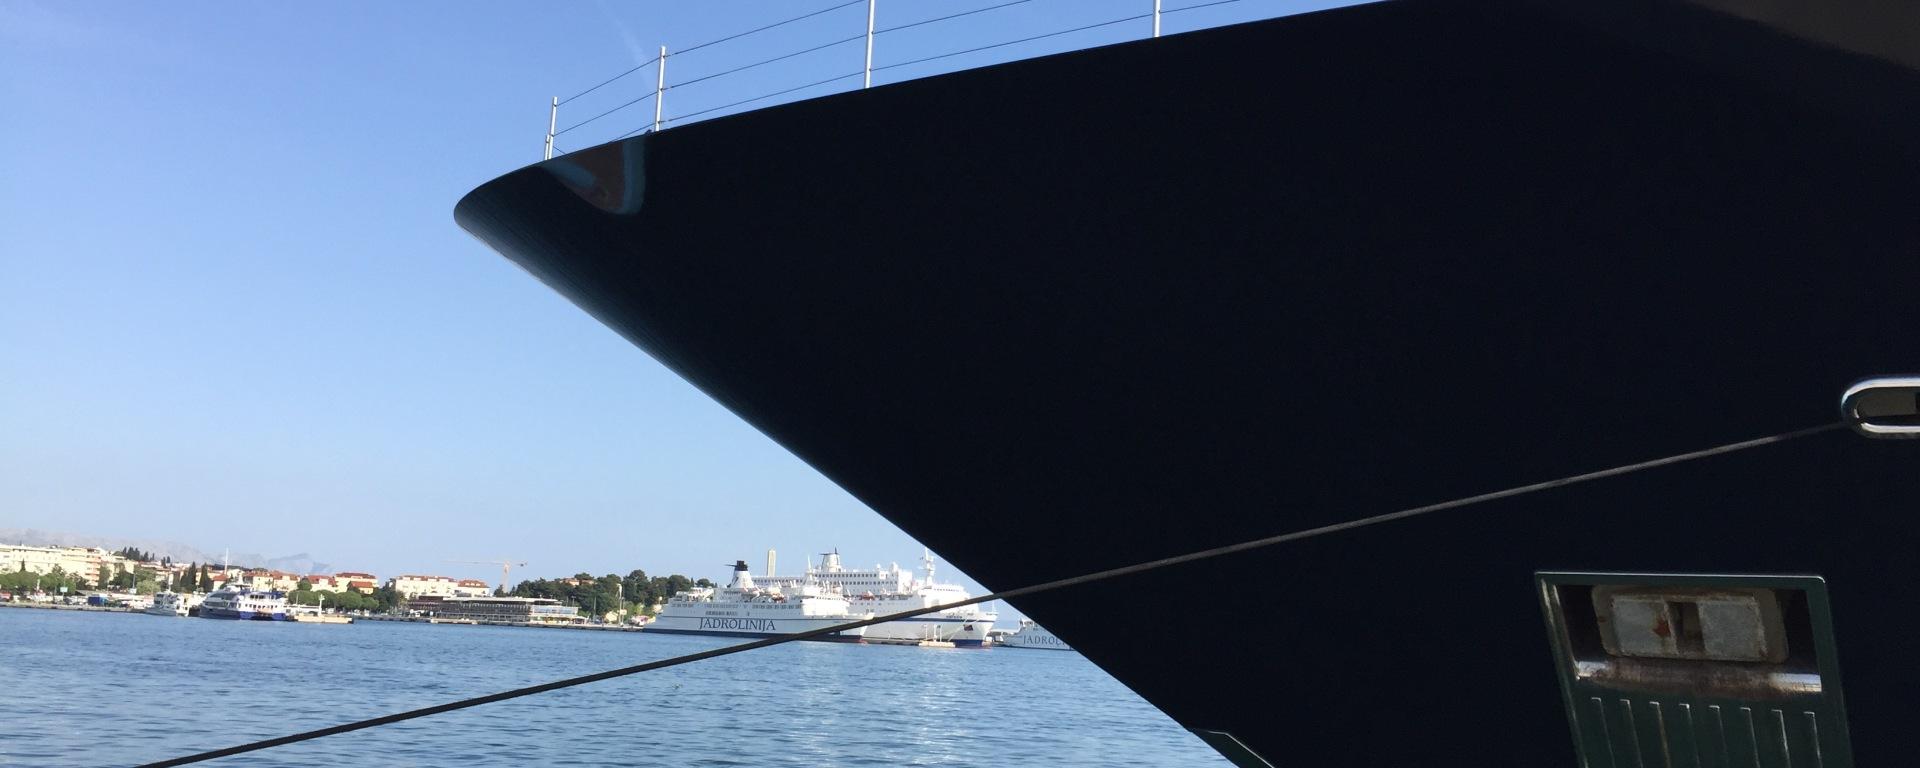 hull of yacht against blue sky and sea in split croatia